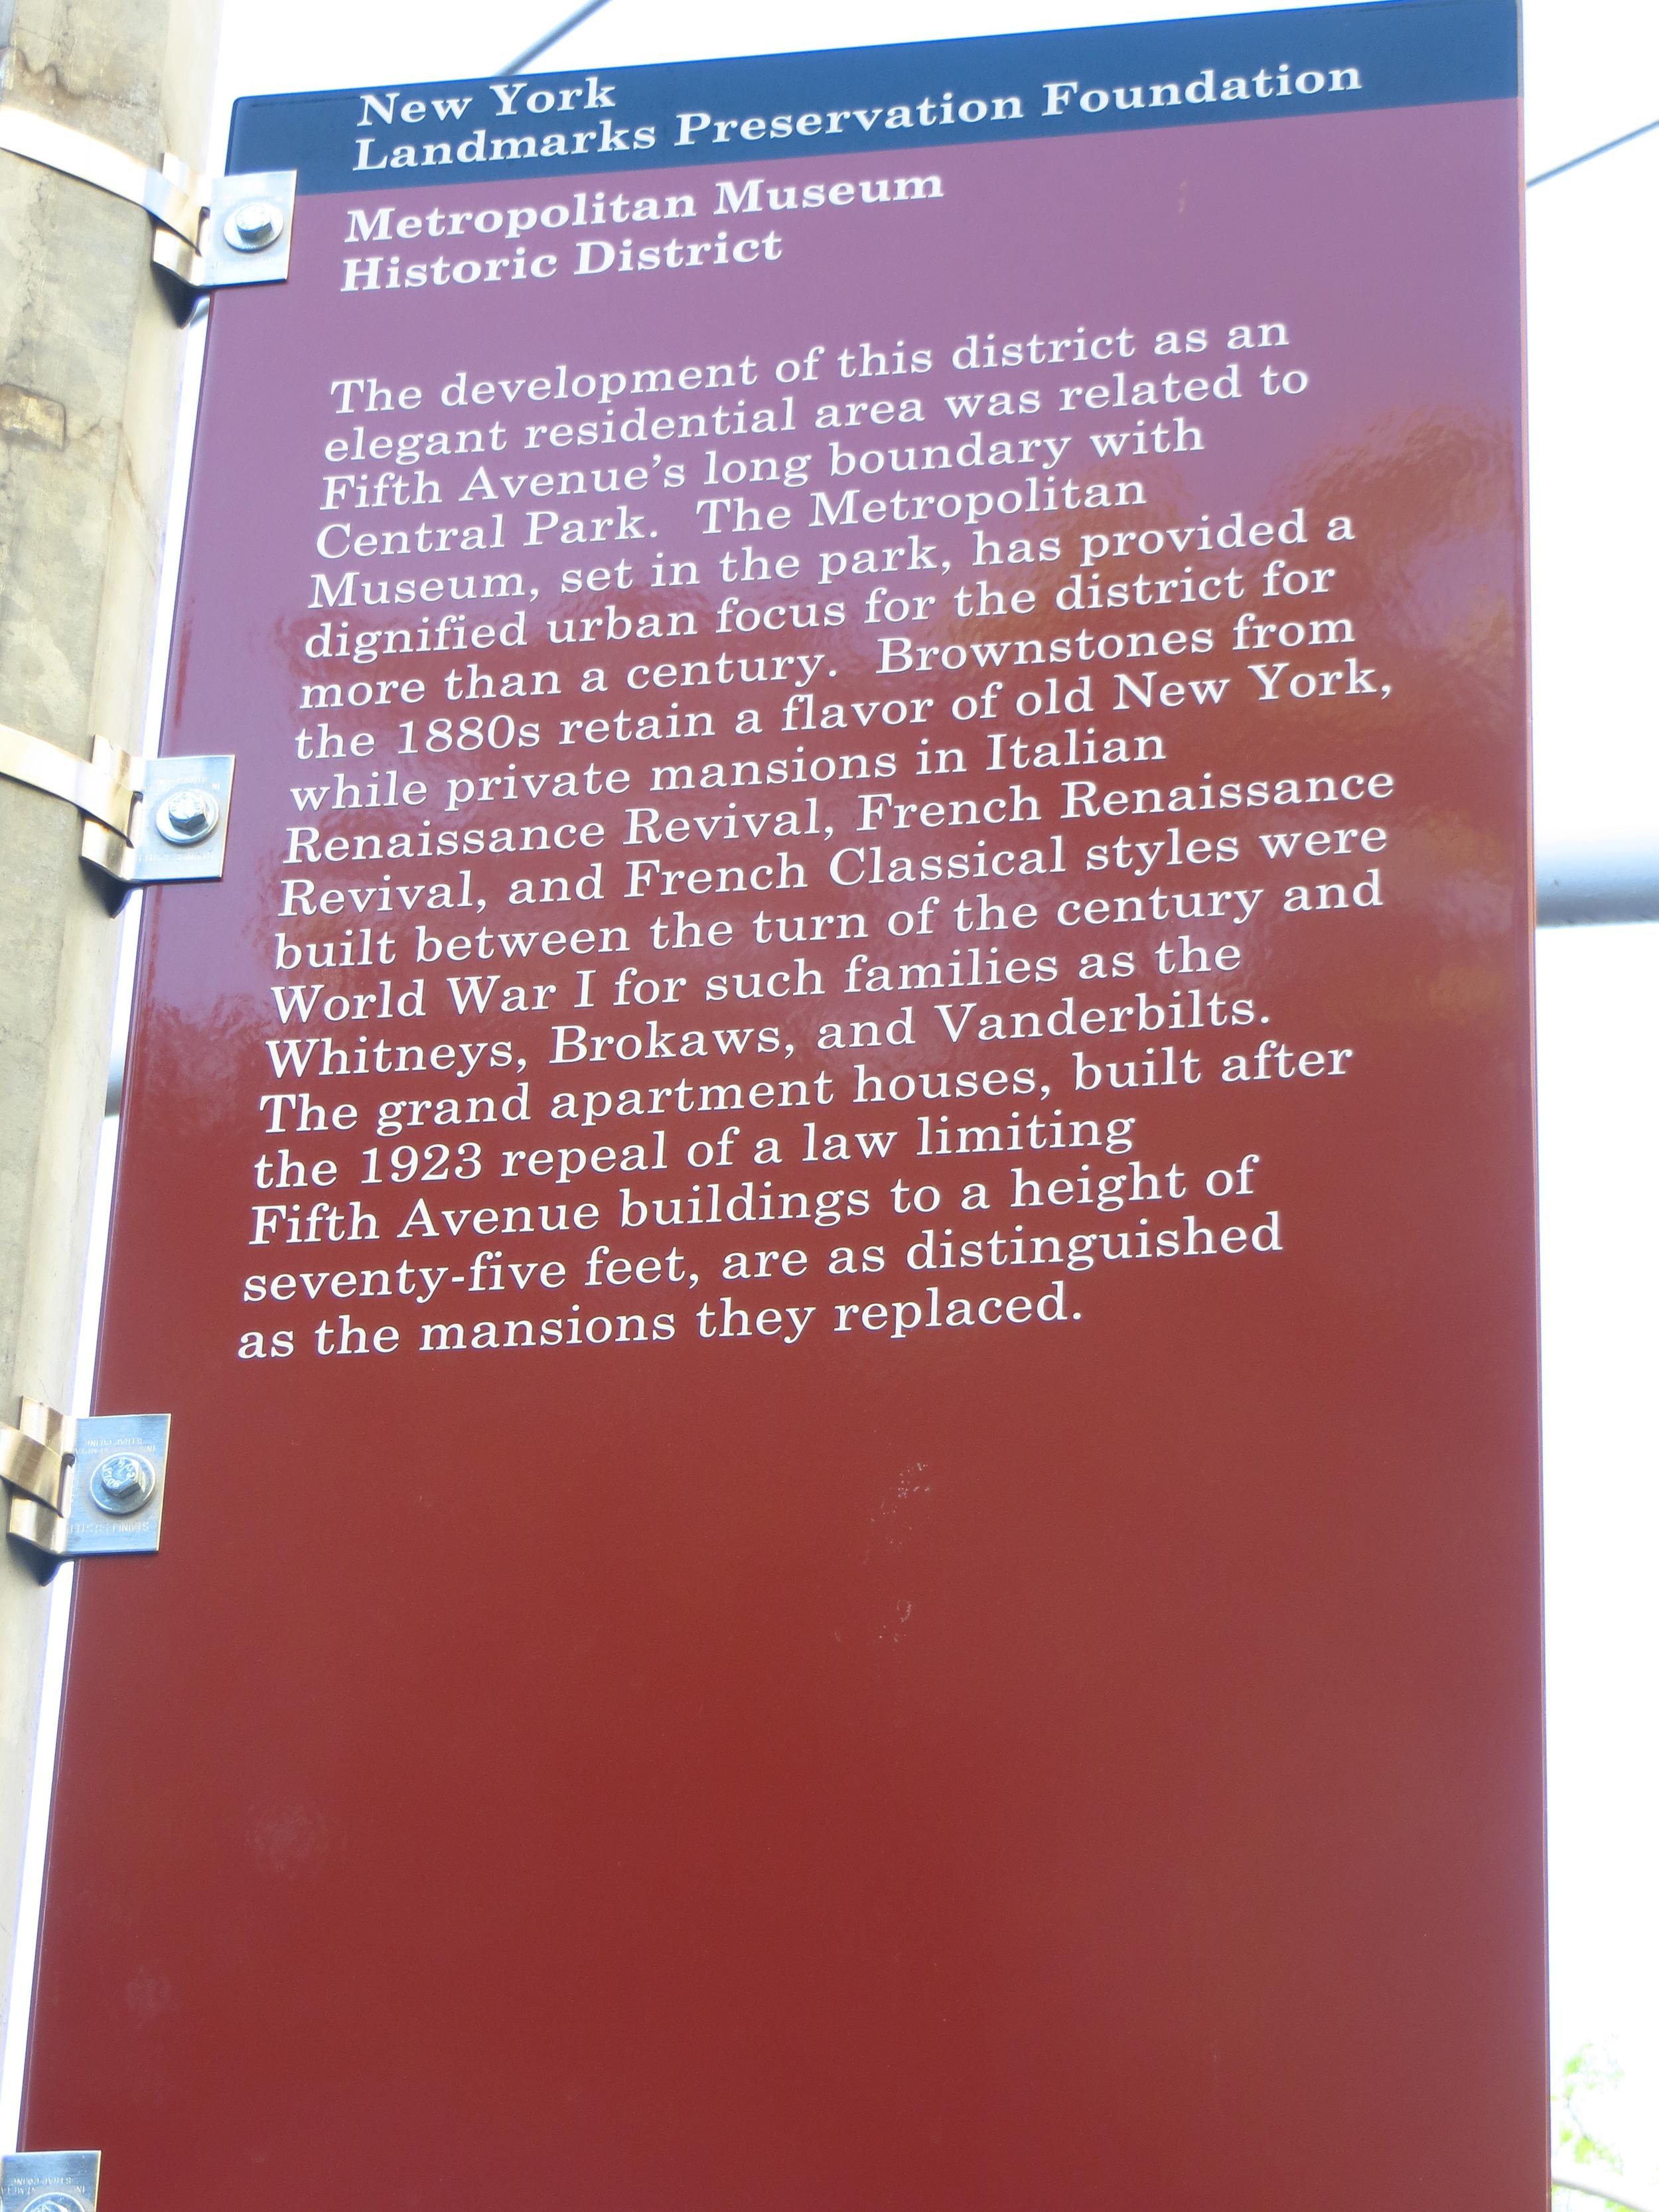 Historical info